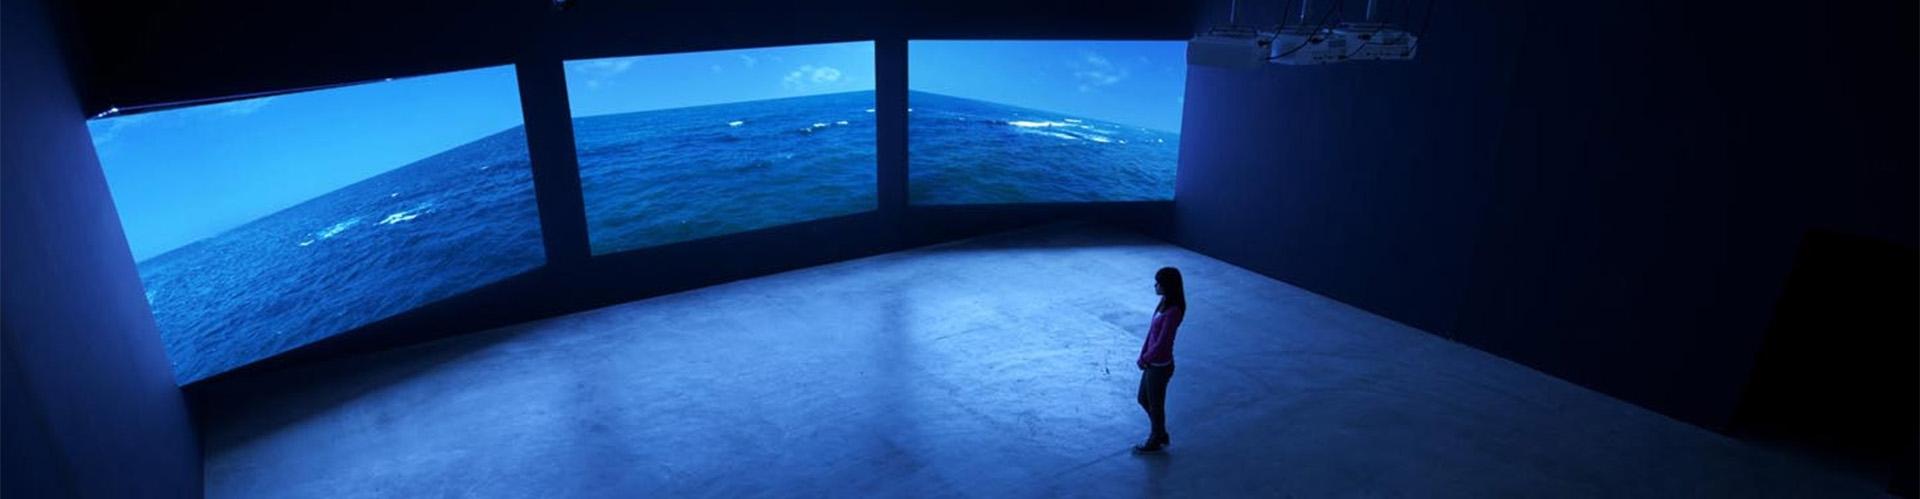 Yuan Goang-ming Disappearing Landscape – Passing Ii image